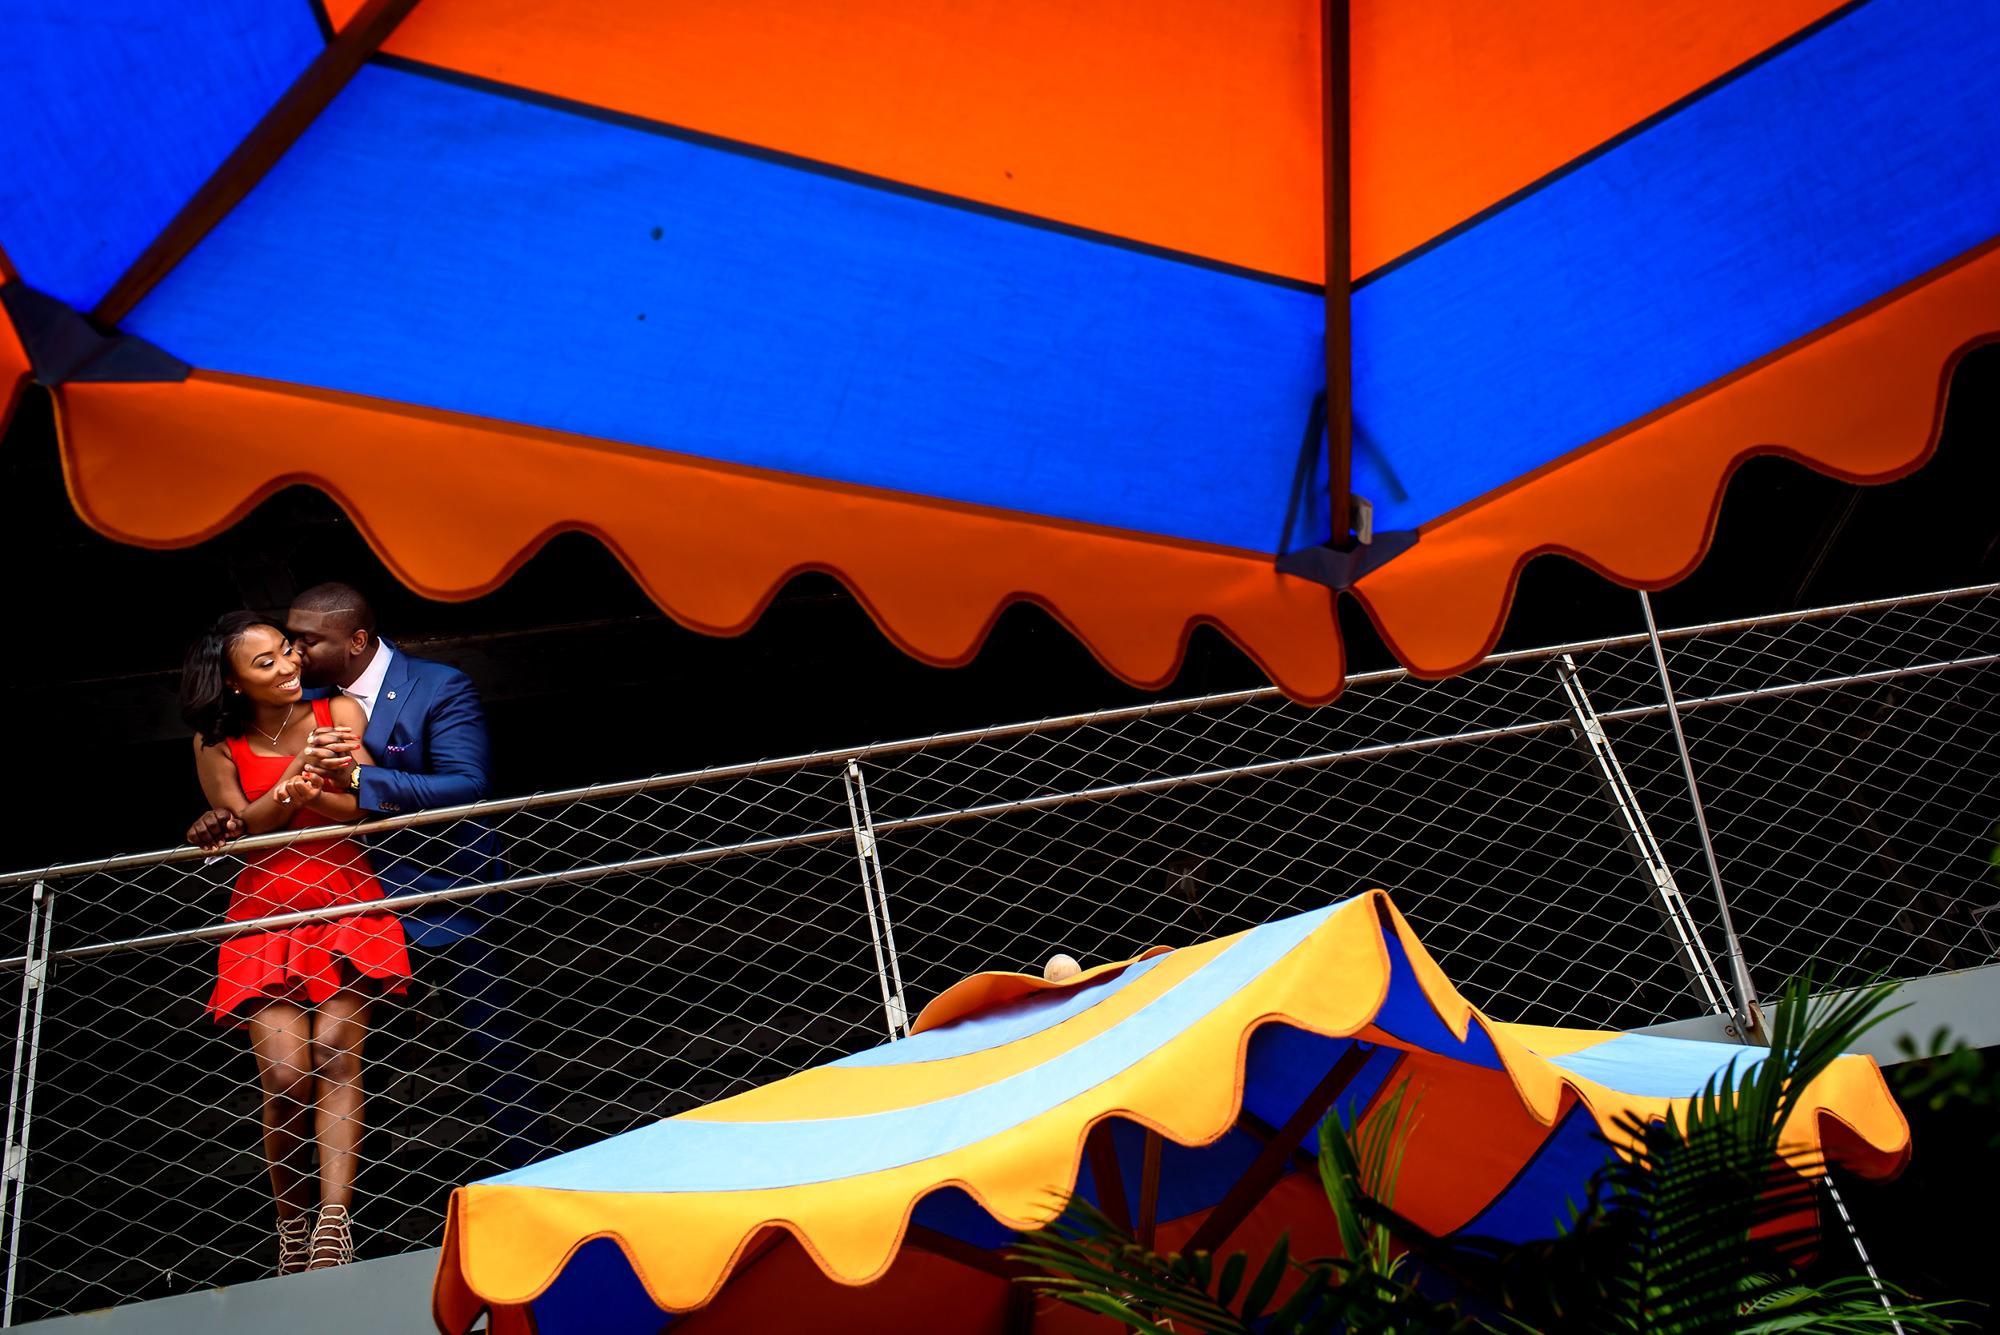 engagement-photo-fun-portrait-near-colorful-umbrellas-worlds-best-wedding-photos-jide-alakija-new-york-wedding-photographers